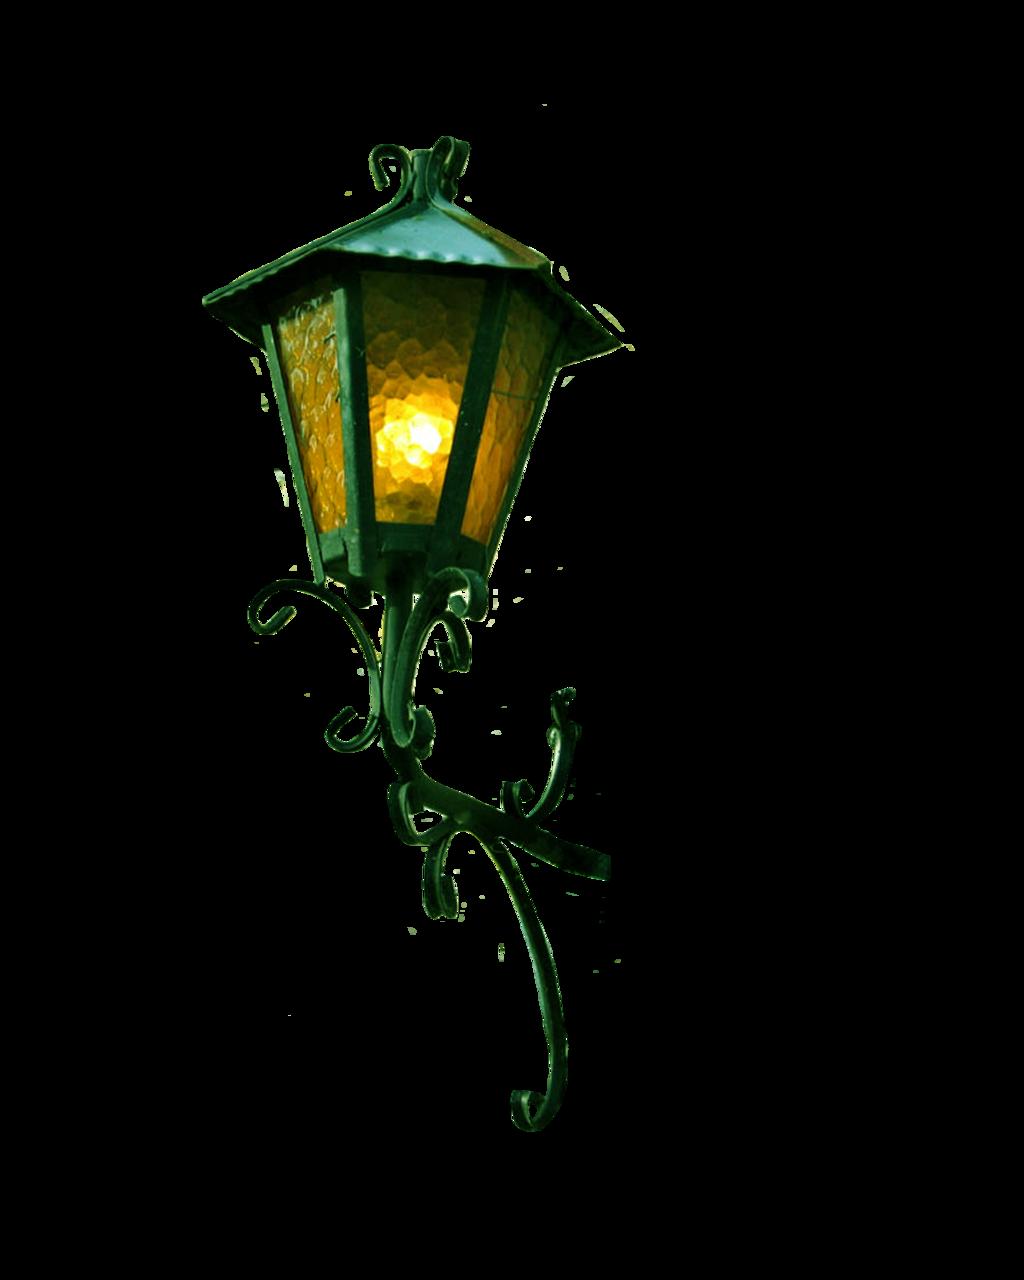 Wall Lamp Wall Lamp Antique Lanterns Street Lamp